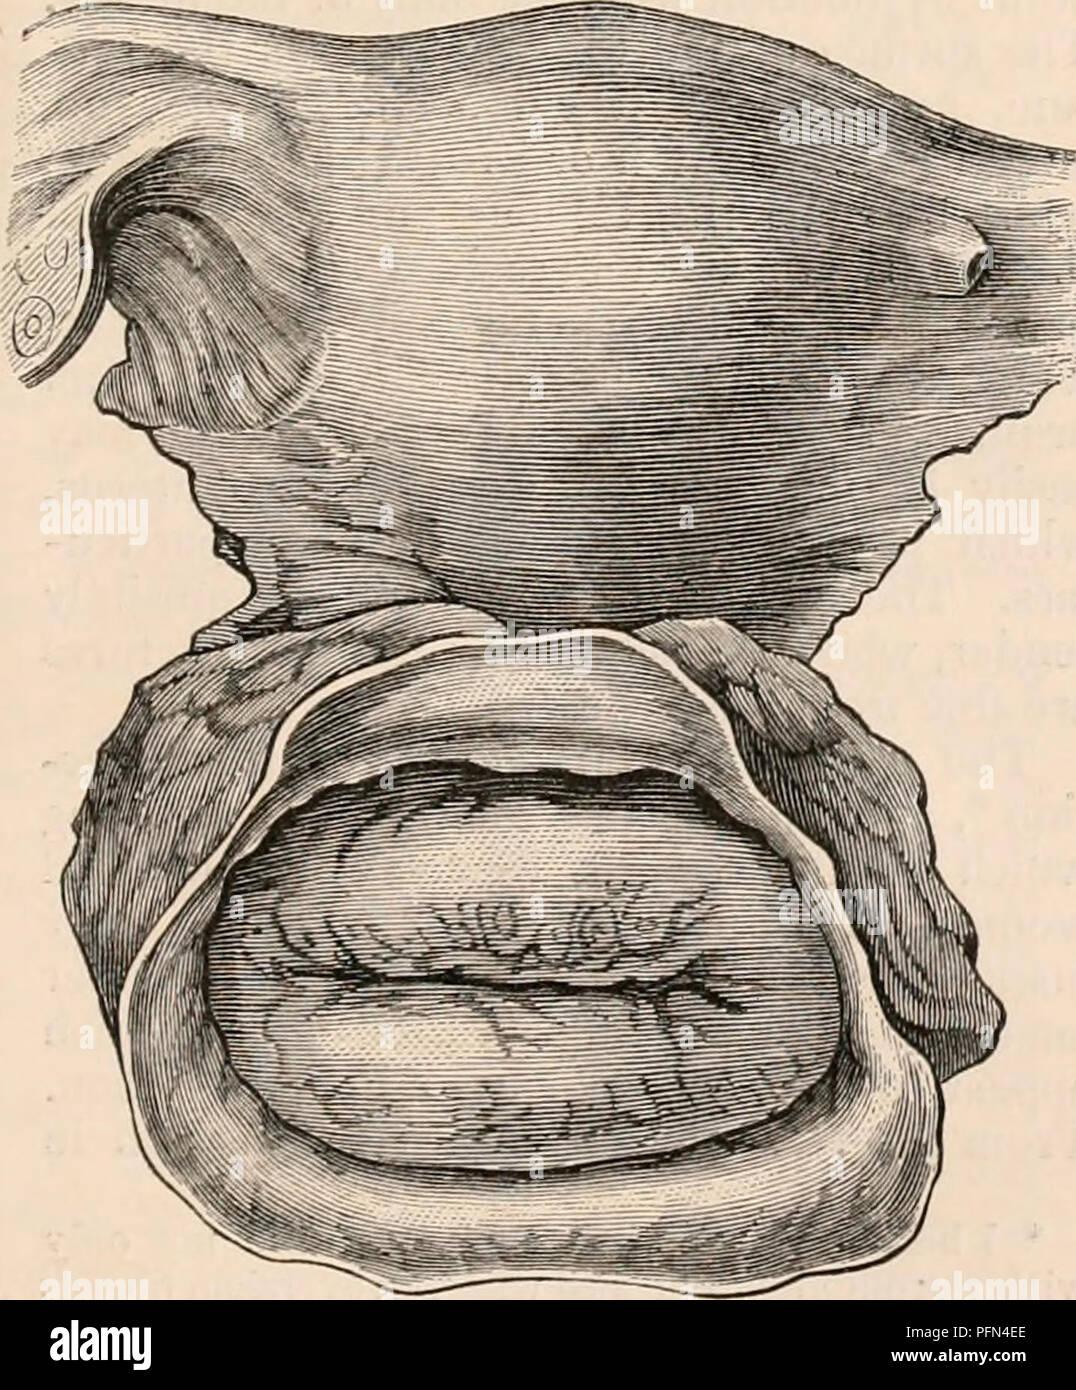 Uterine Cervix Imágenes De Stock & Uterine Cervix Fotos De Stock - Alamy